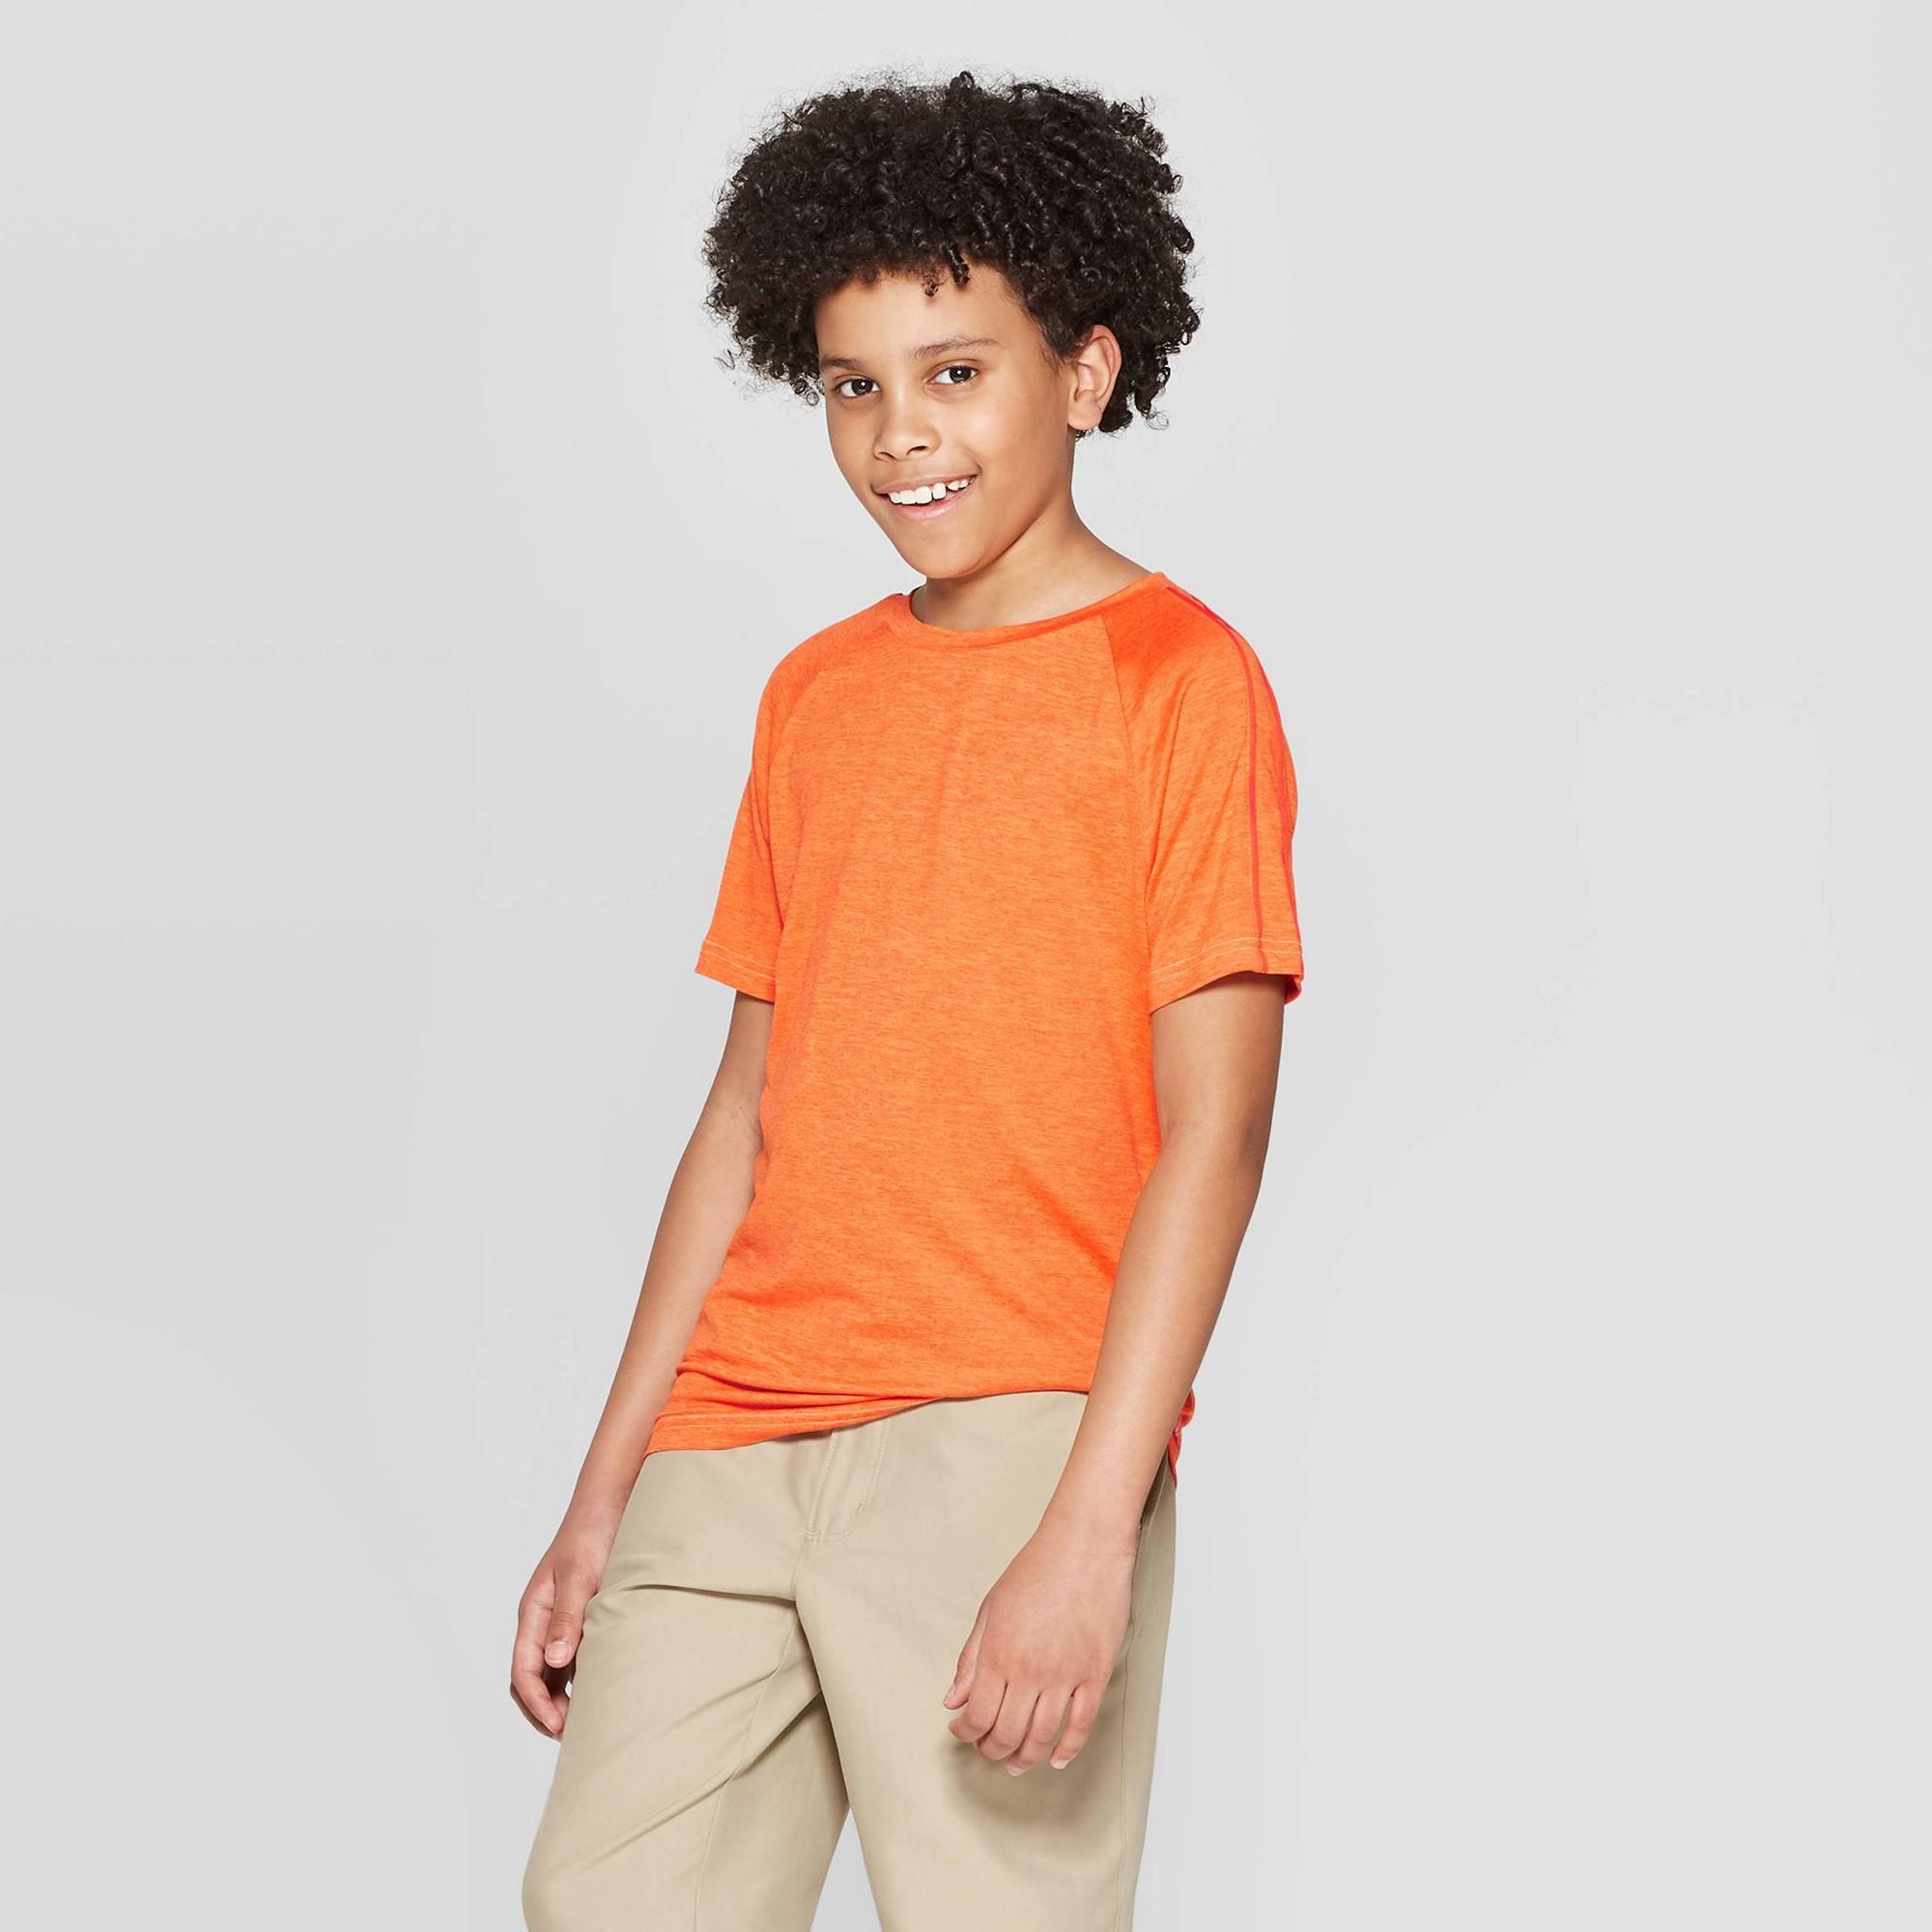 Boys' Super Soft Tech T-Shirt - C9 Champion Orange S, Boy's, Size: Small